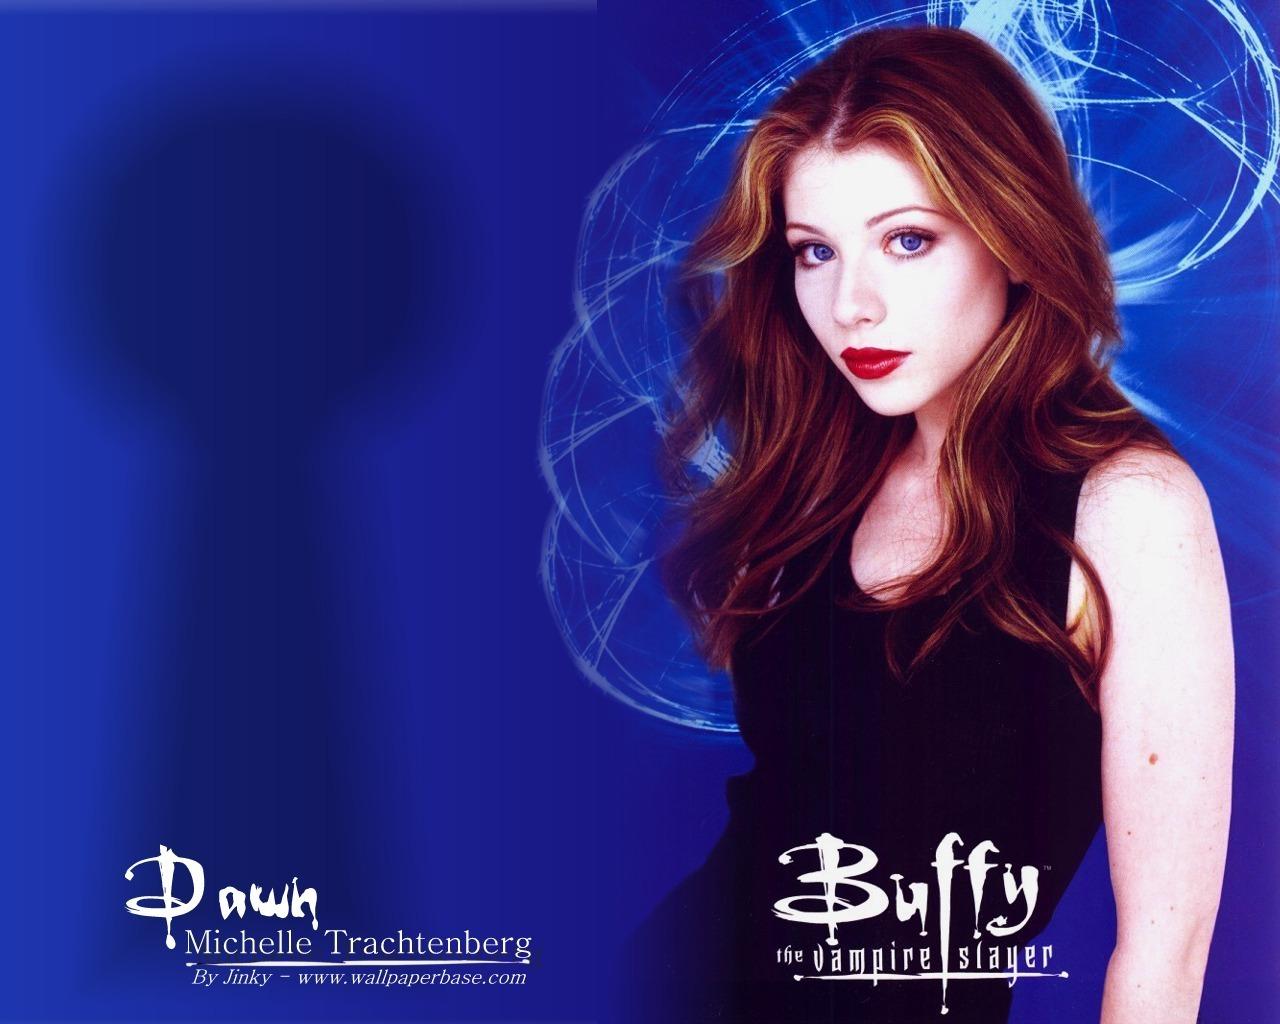 Buffy the Vampire Slayer buffy wallpaper